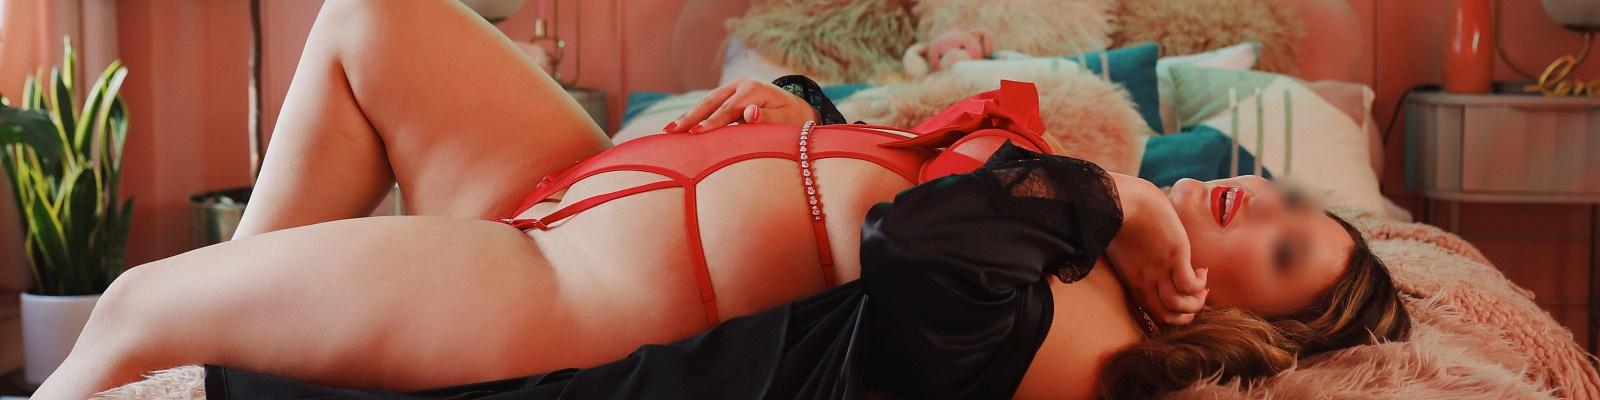 PornStar Lexie Foxx Escort